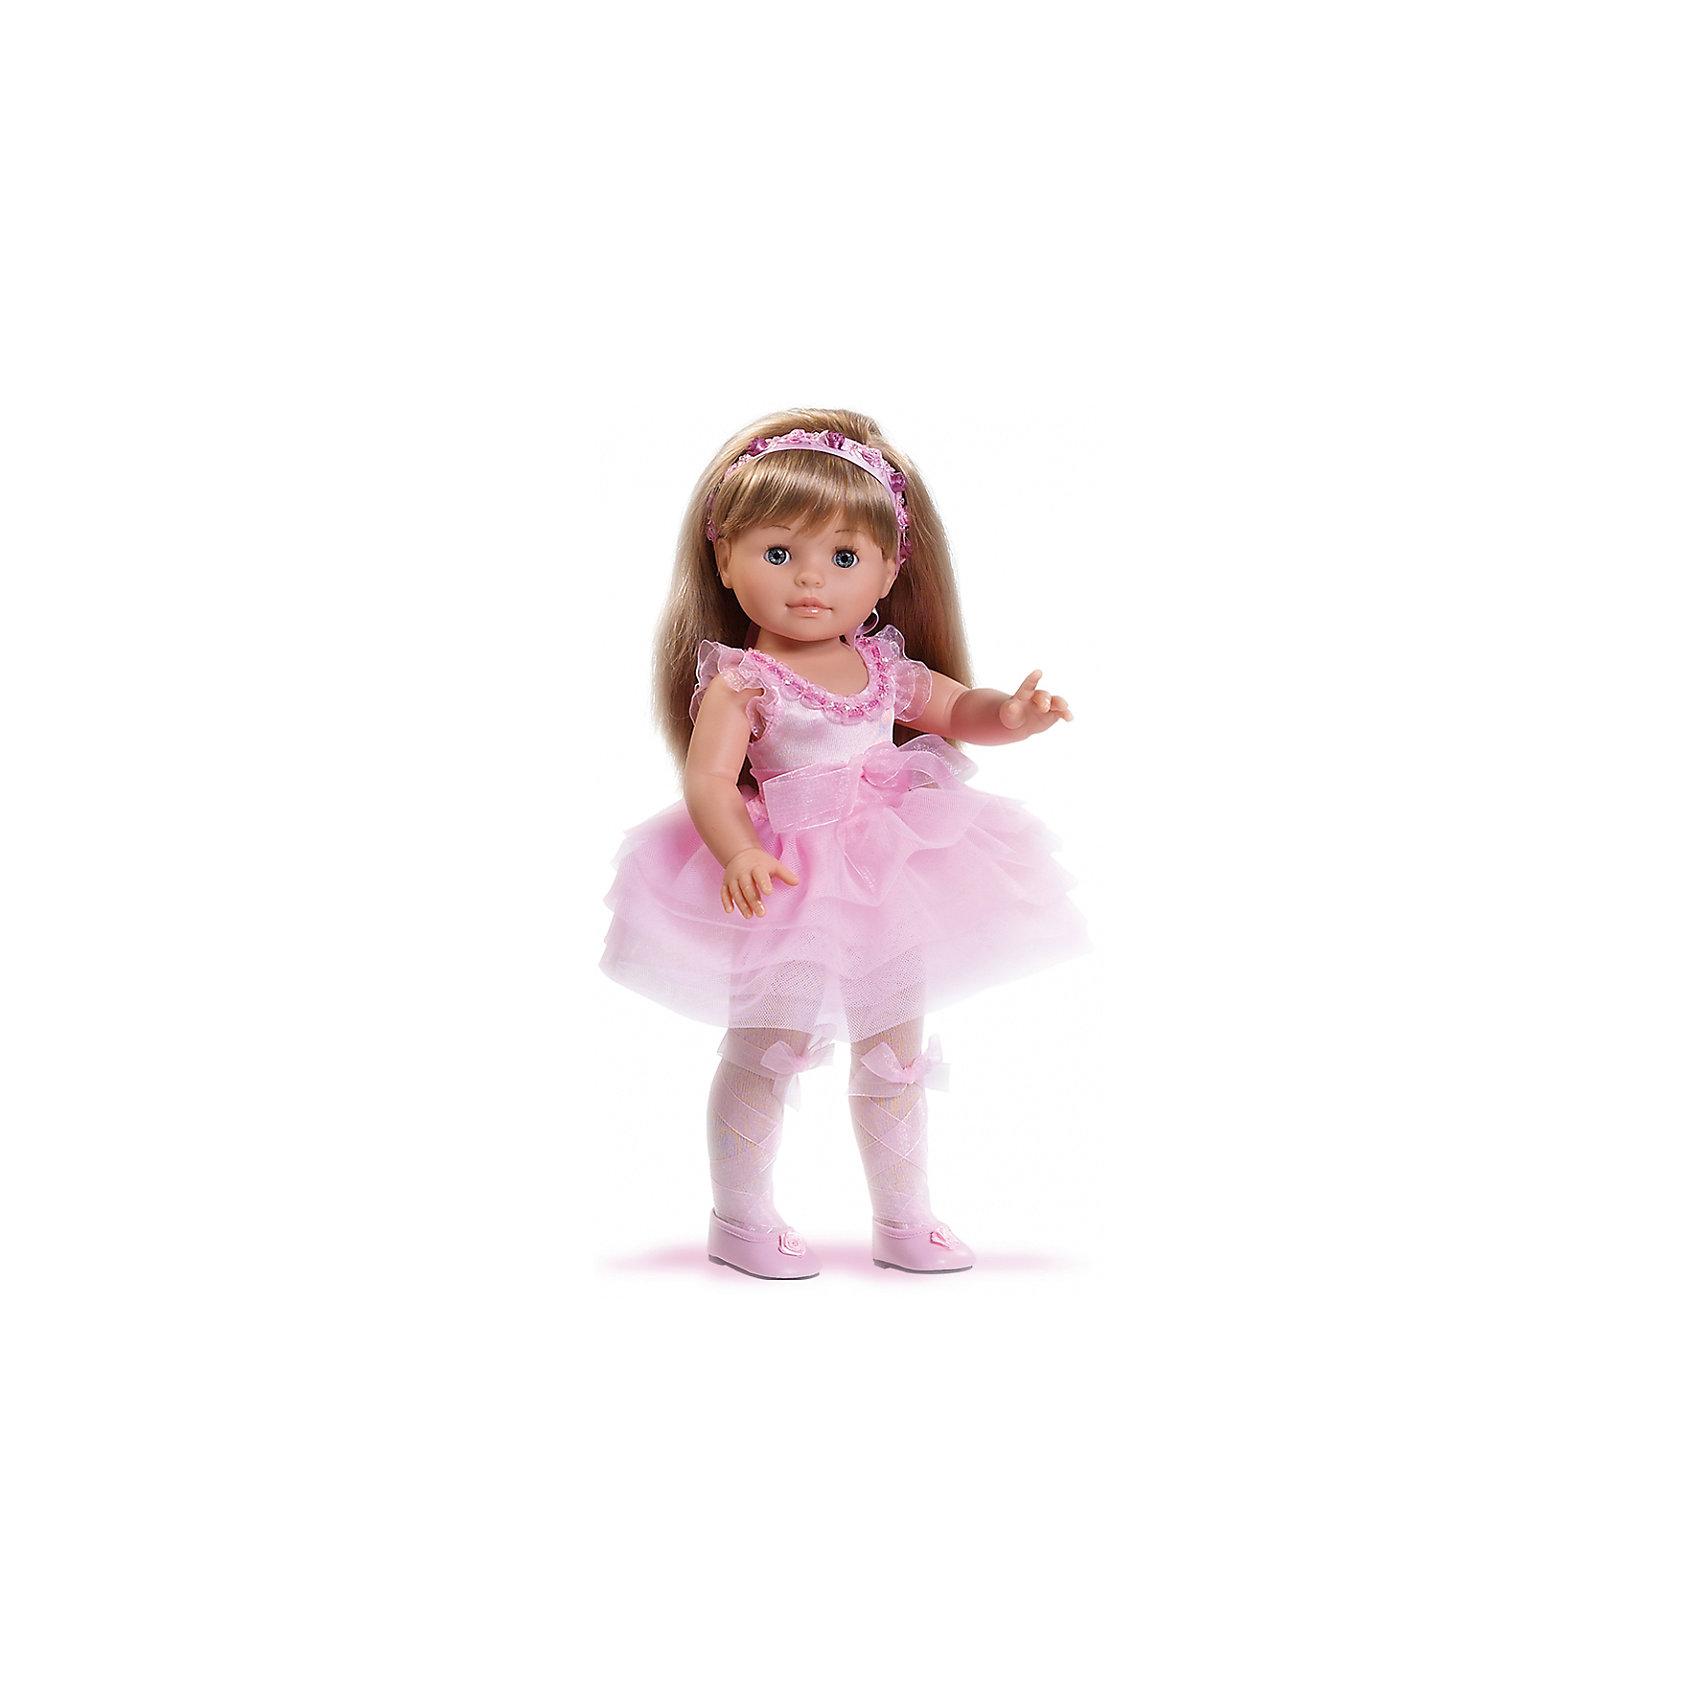 Paola Reina Кукла Сой Ту, 40 см, Paola Reina paola reina пупс без одежды 22 см 31019